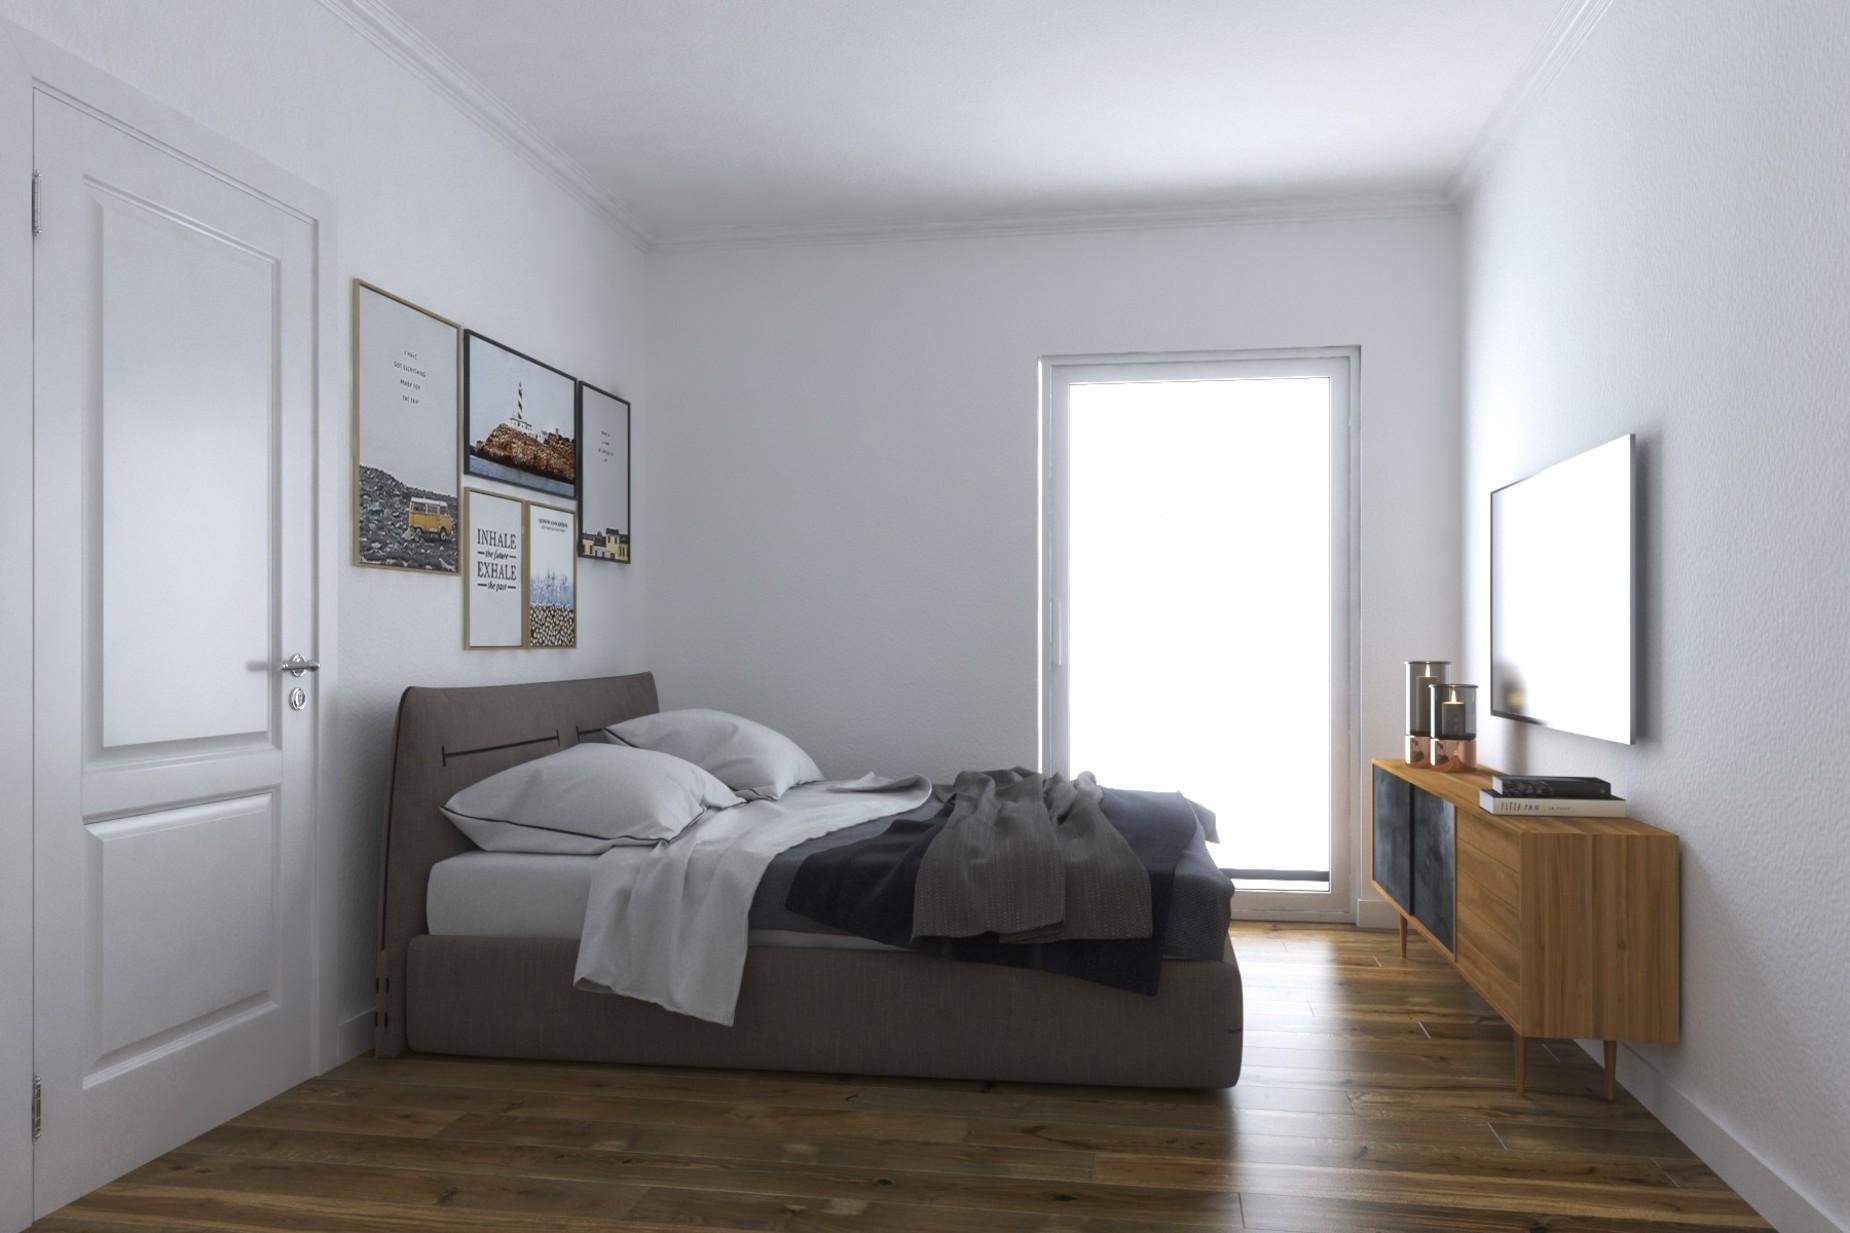 2 bed Apartment For Sale in Birkirkara, Birkirkara - thumb 5